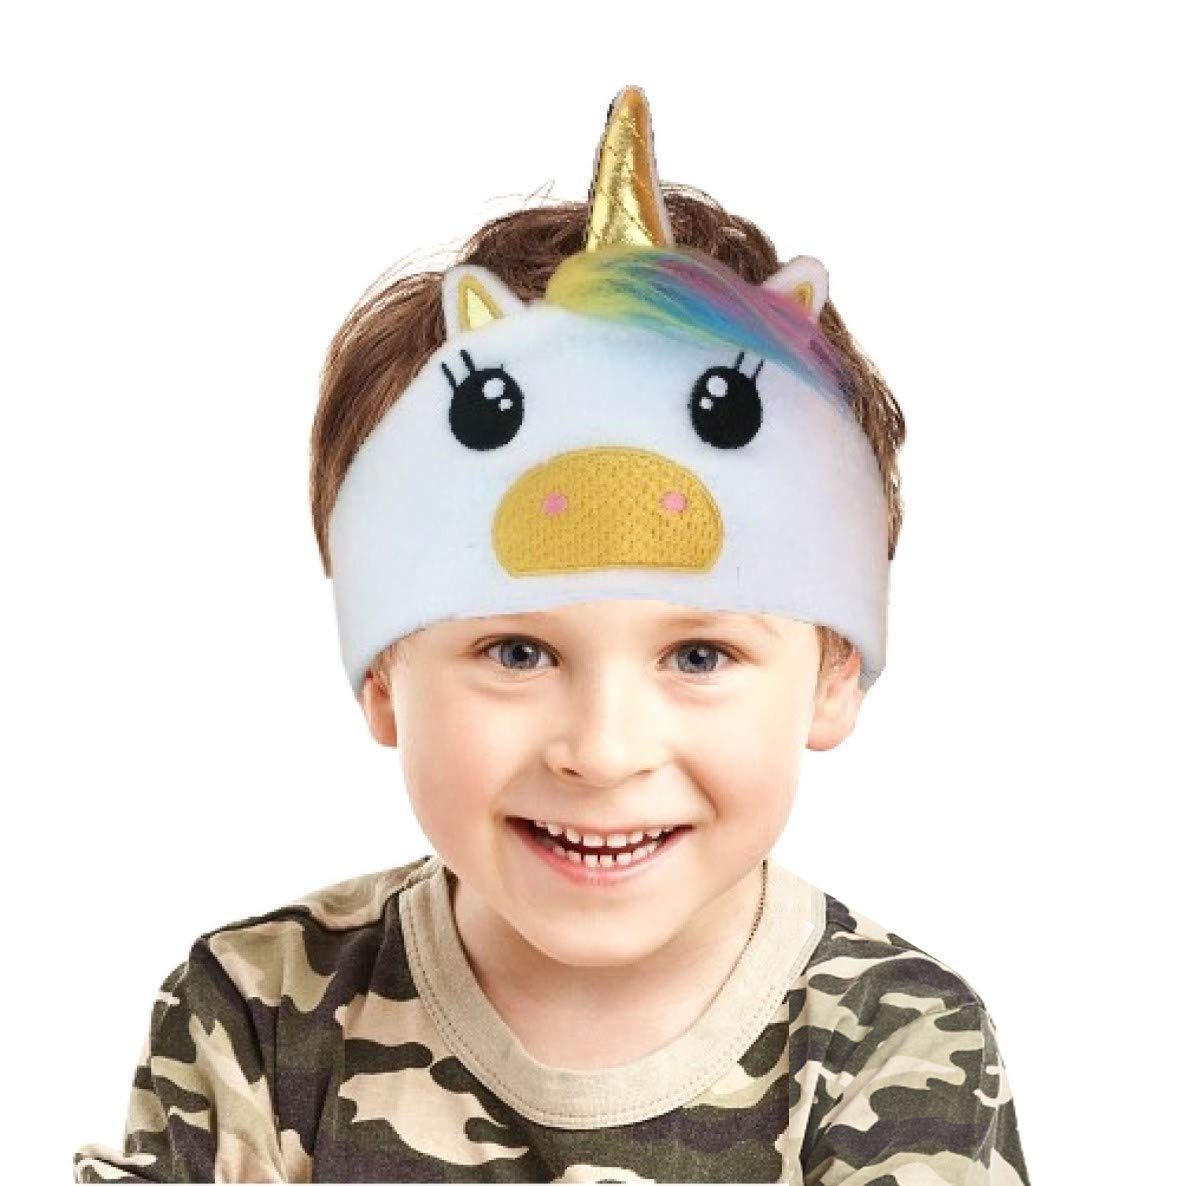 Kids Headphones Children Girls Boys Teens Volume Limiting Foldable and Durable Headphone Headband for School, Home and Travel (White)